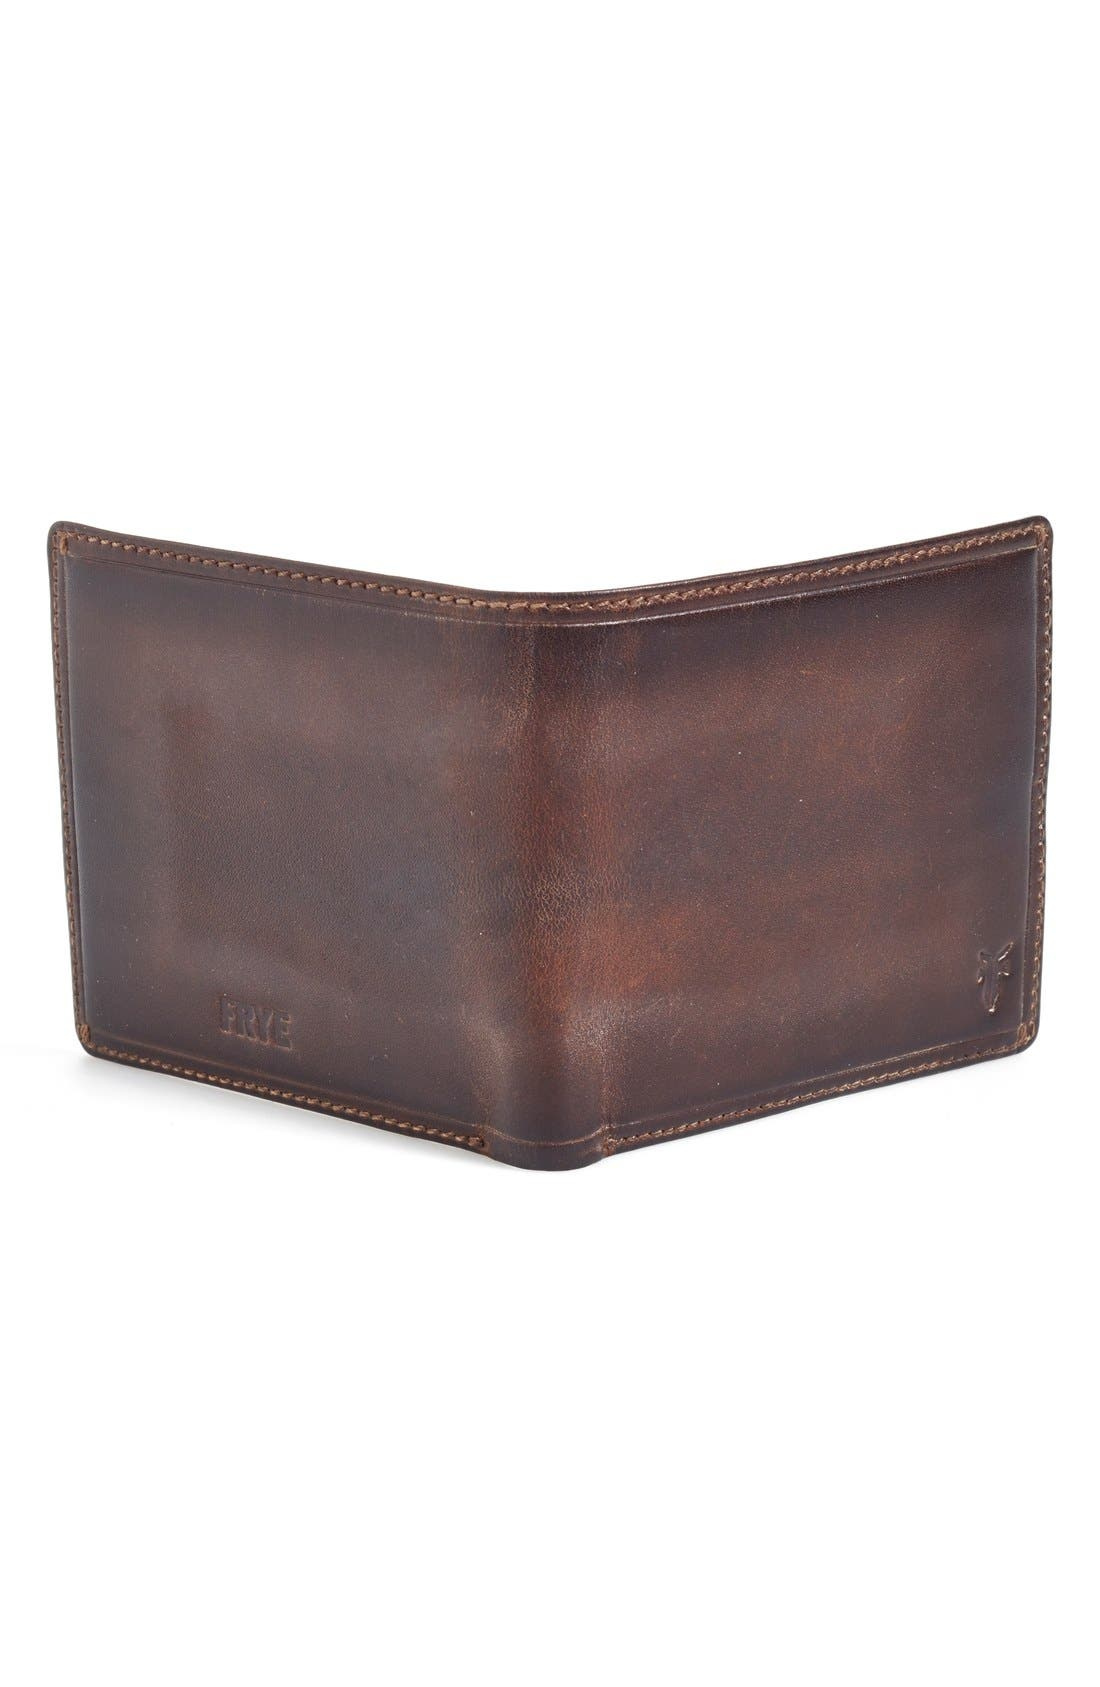 'Logan' Leather Billfold Wallet,                             Alternate thumbnail 2, color,                             SLATE